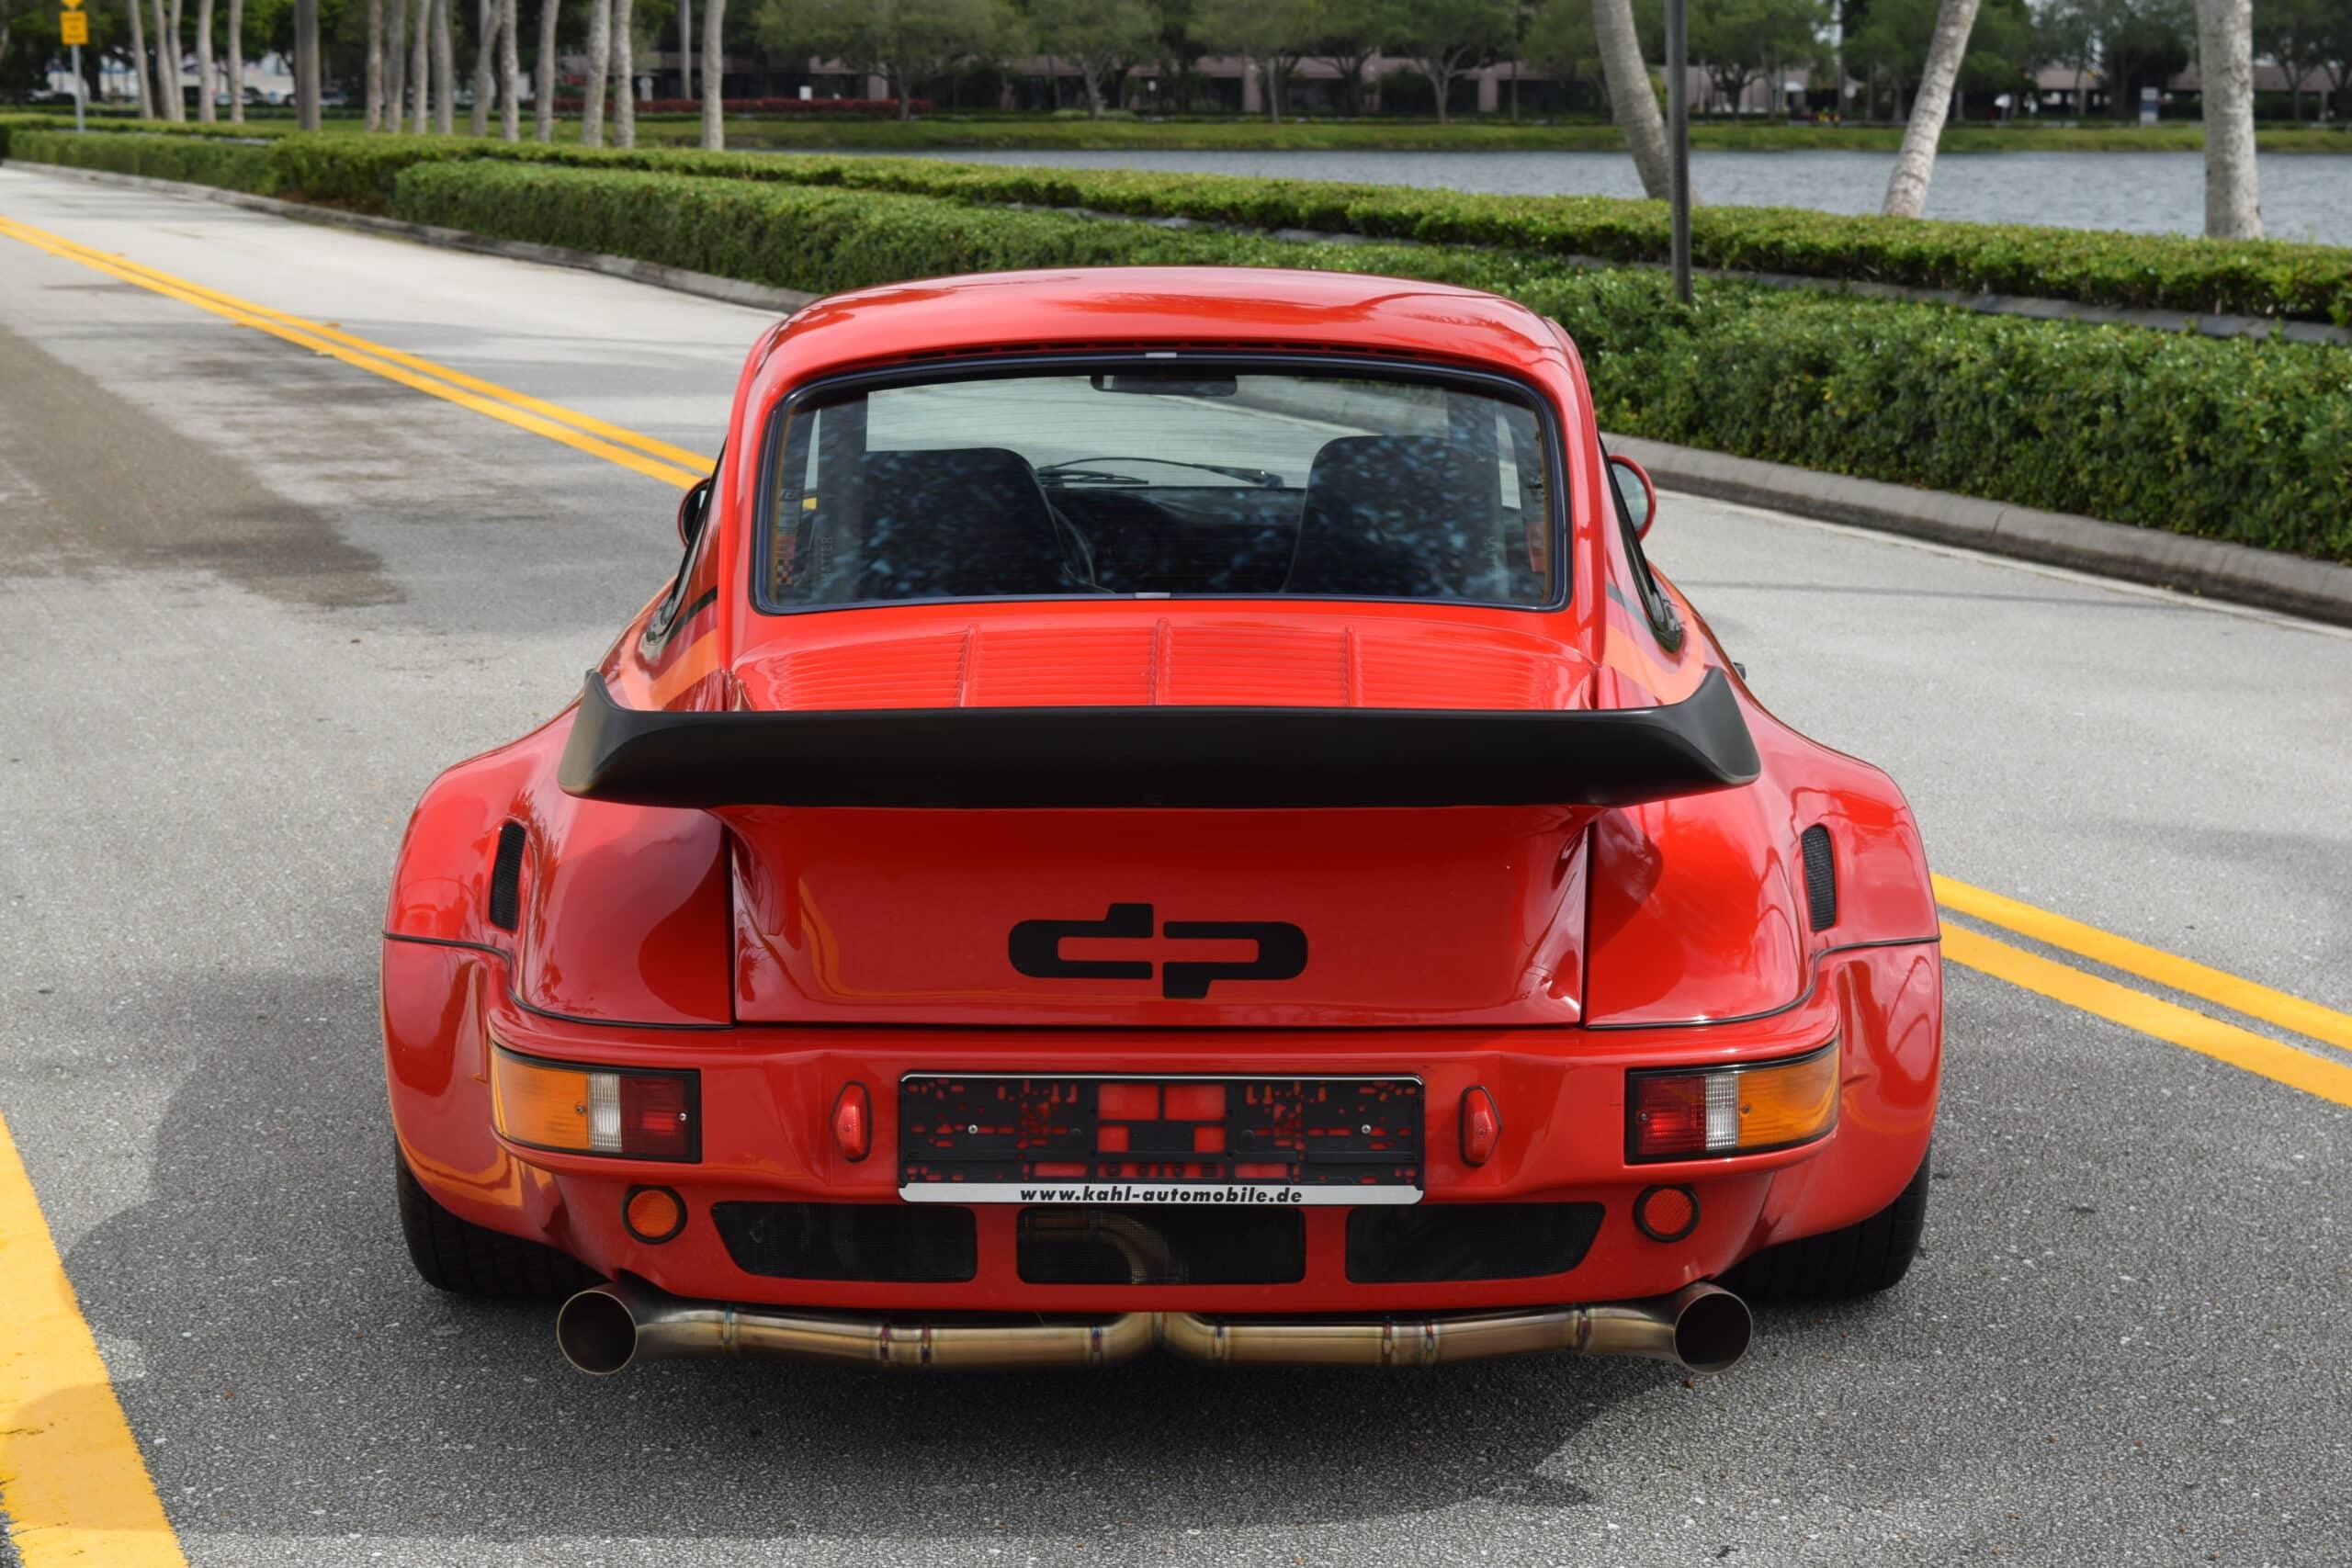 1979 very rare, REAL and desirable DP Motorsport 935 I – RUF CAR Straßen